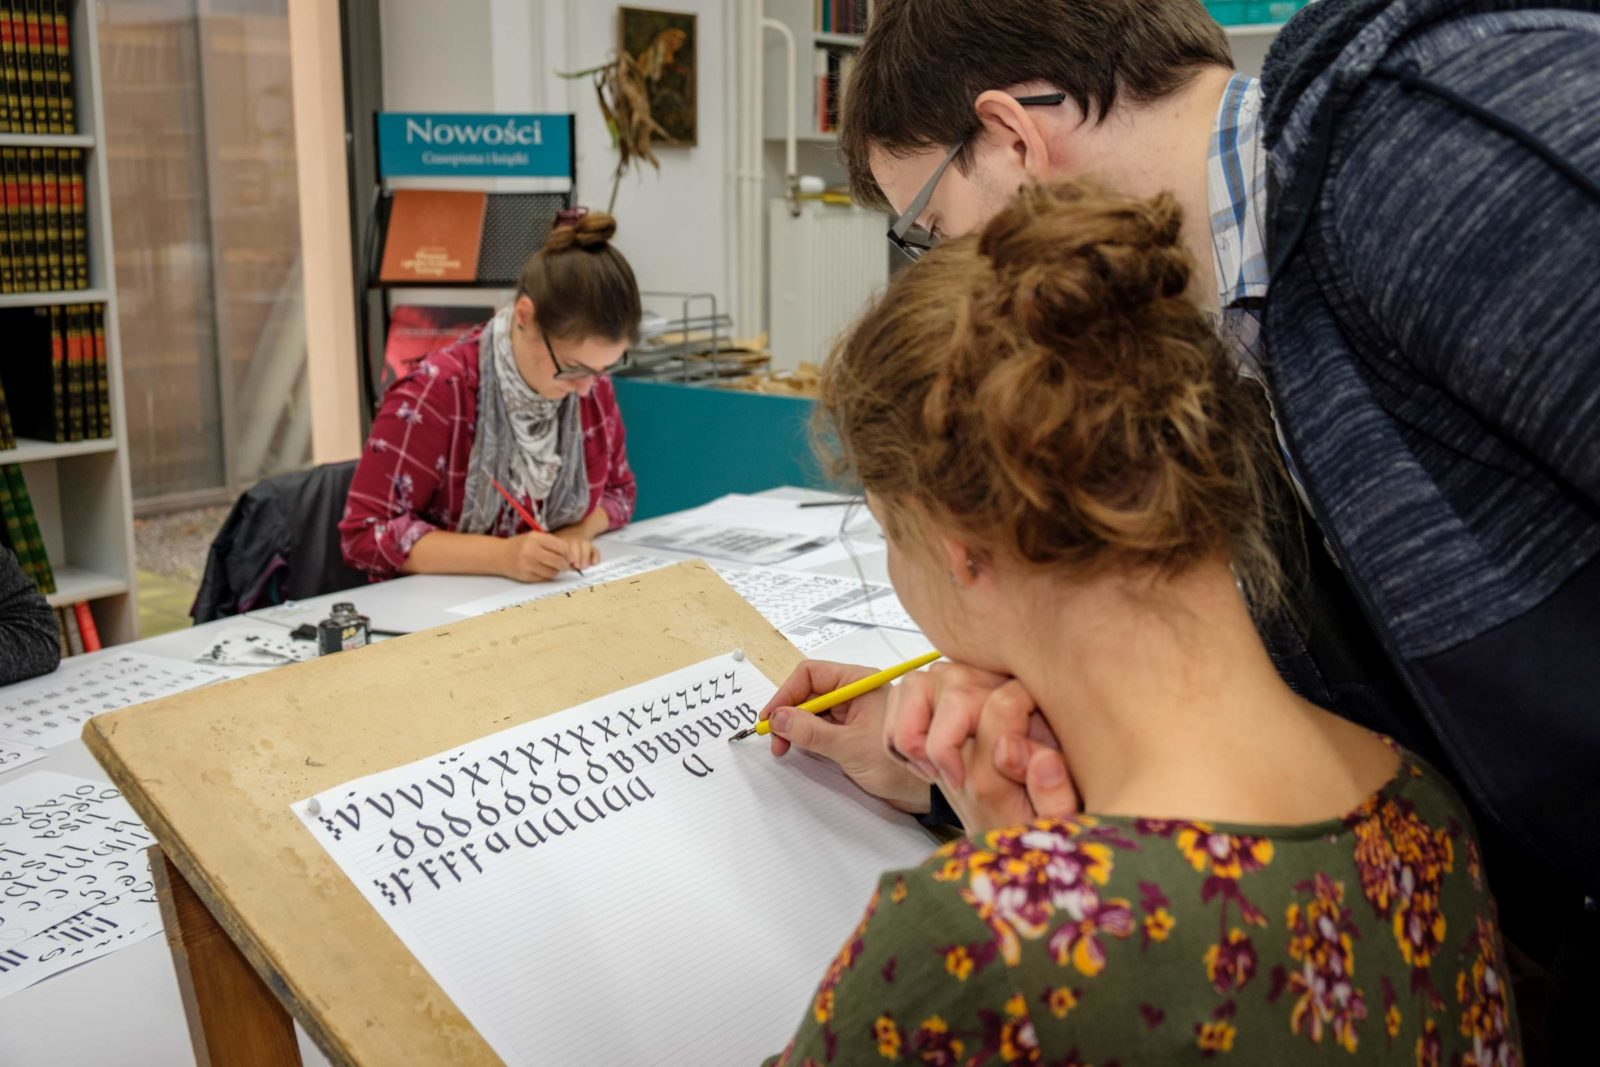 Warschau_2019_Workshop_Calligraphy_IADA_207